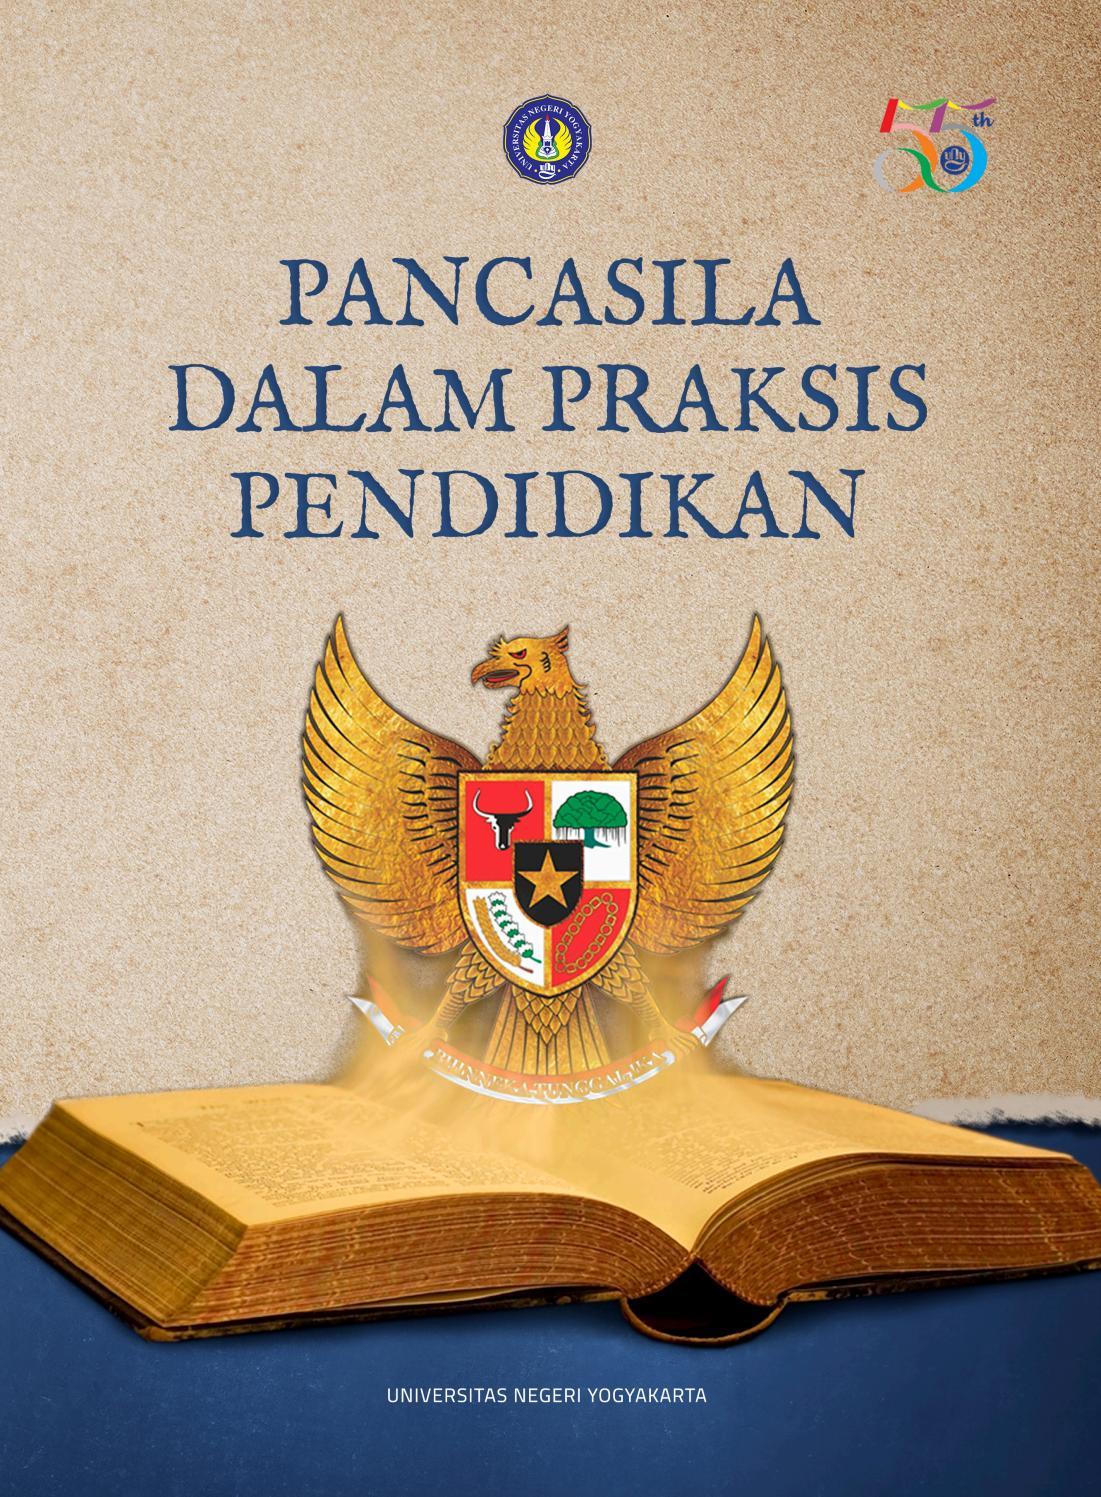 Pancasila Dalam Praksis Pendidikan By Universitas Negeri Yogyakarta Issuu